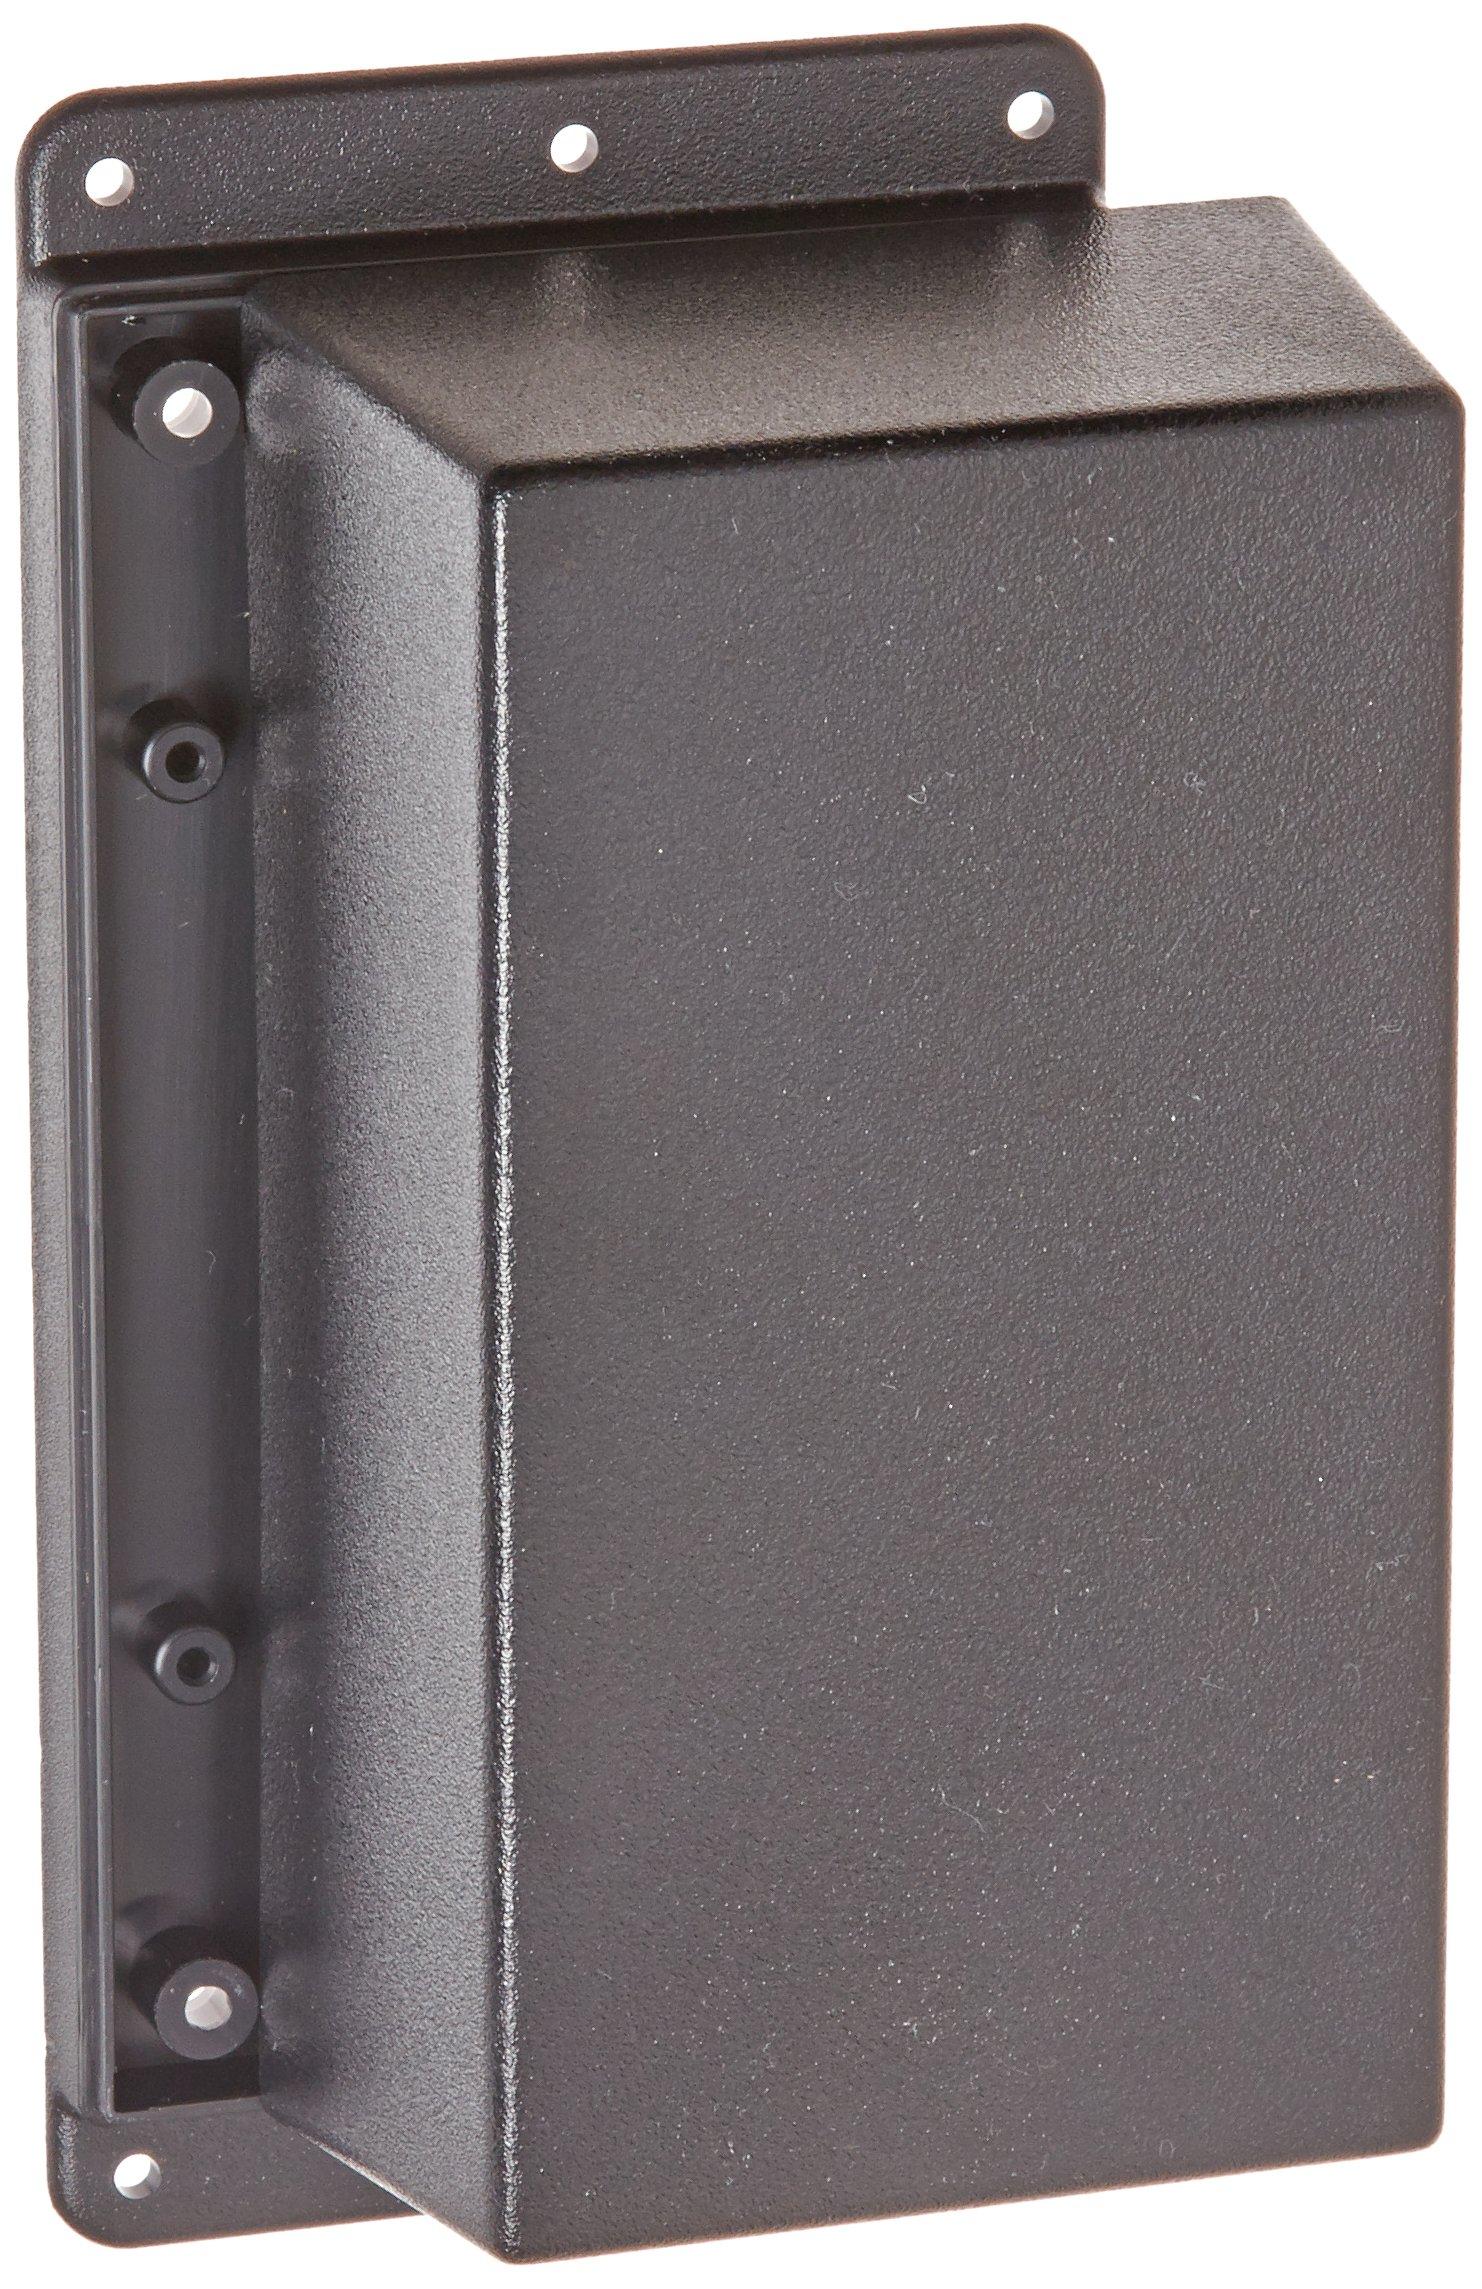 Serpac WM053 ABS Plastic Wall Mount, 6-5/8'' Length x 3.30'' Width x 2-7/64'' Height, Black